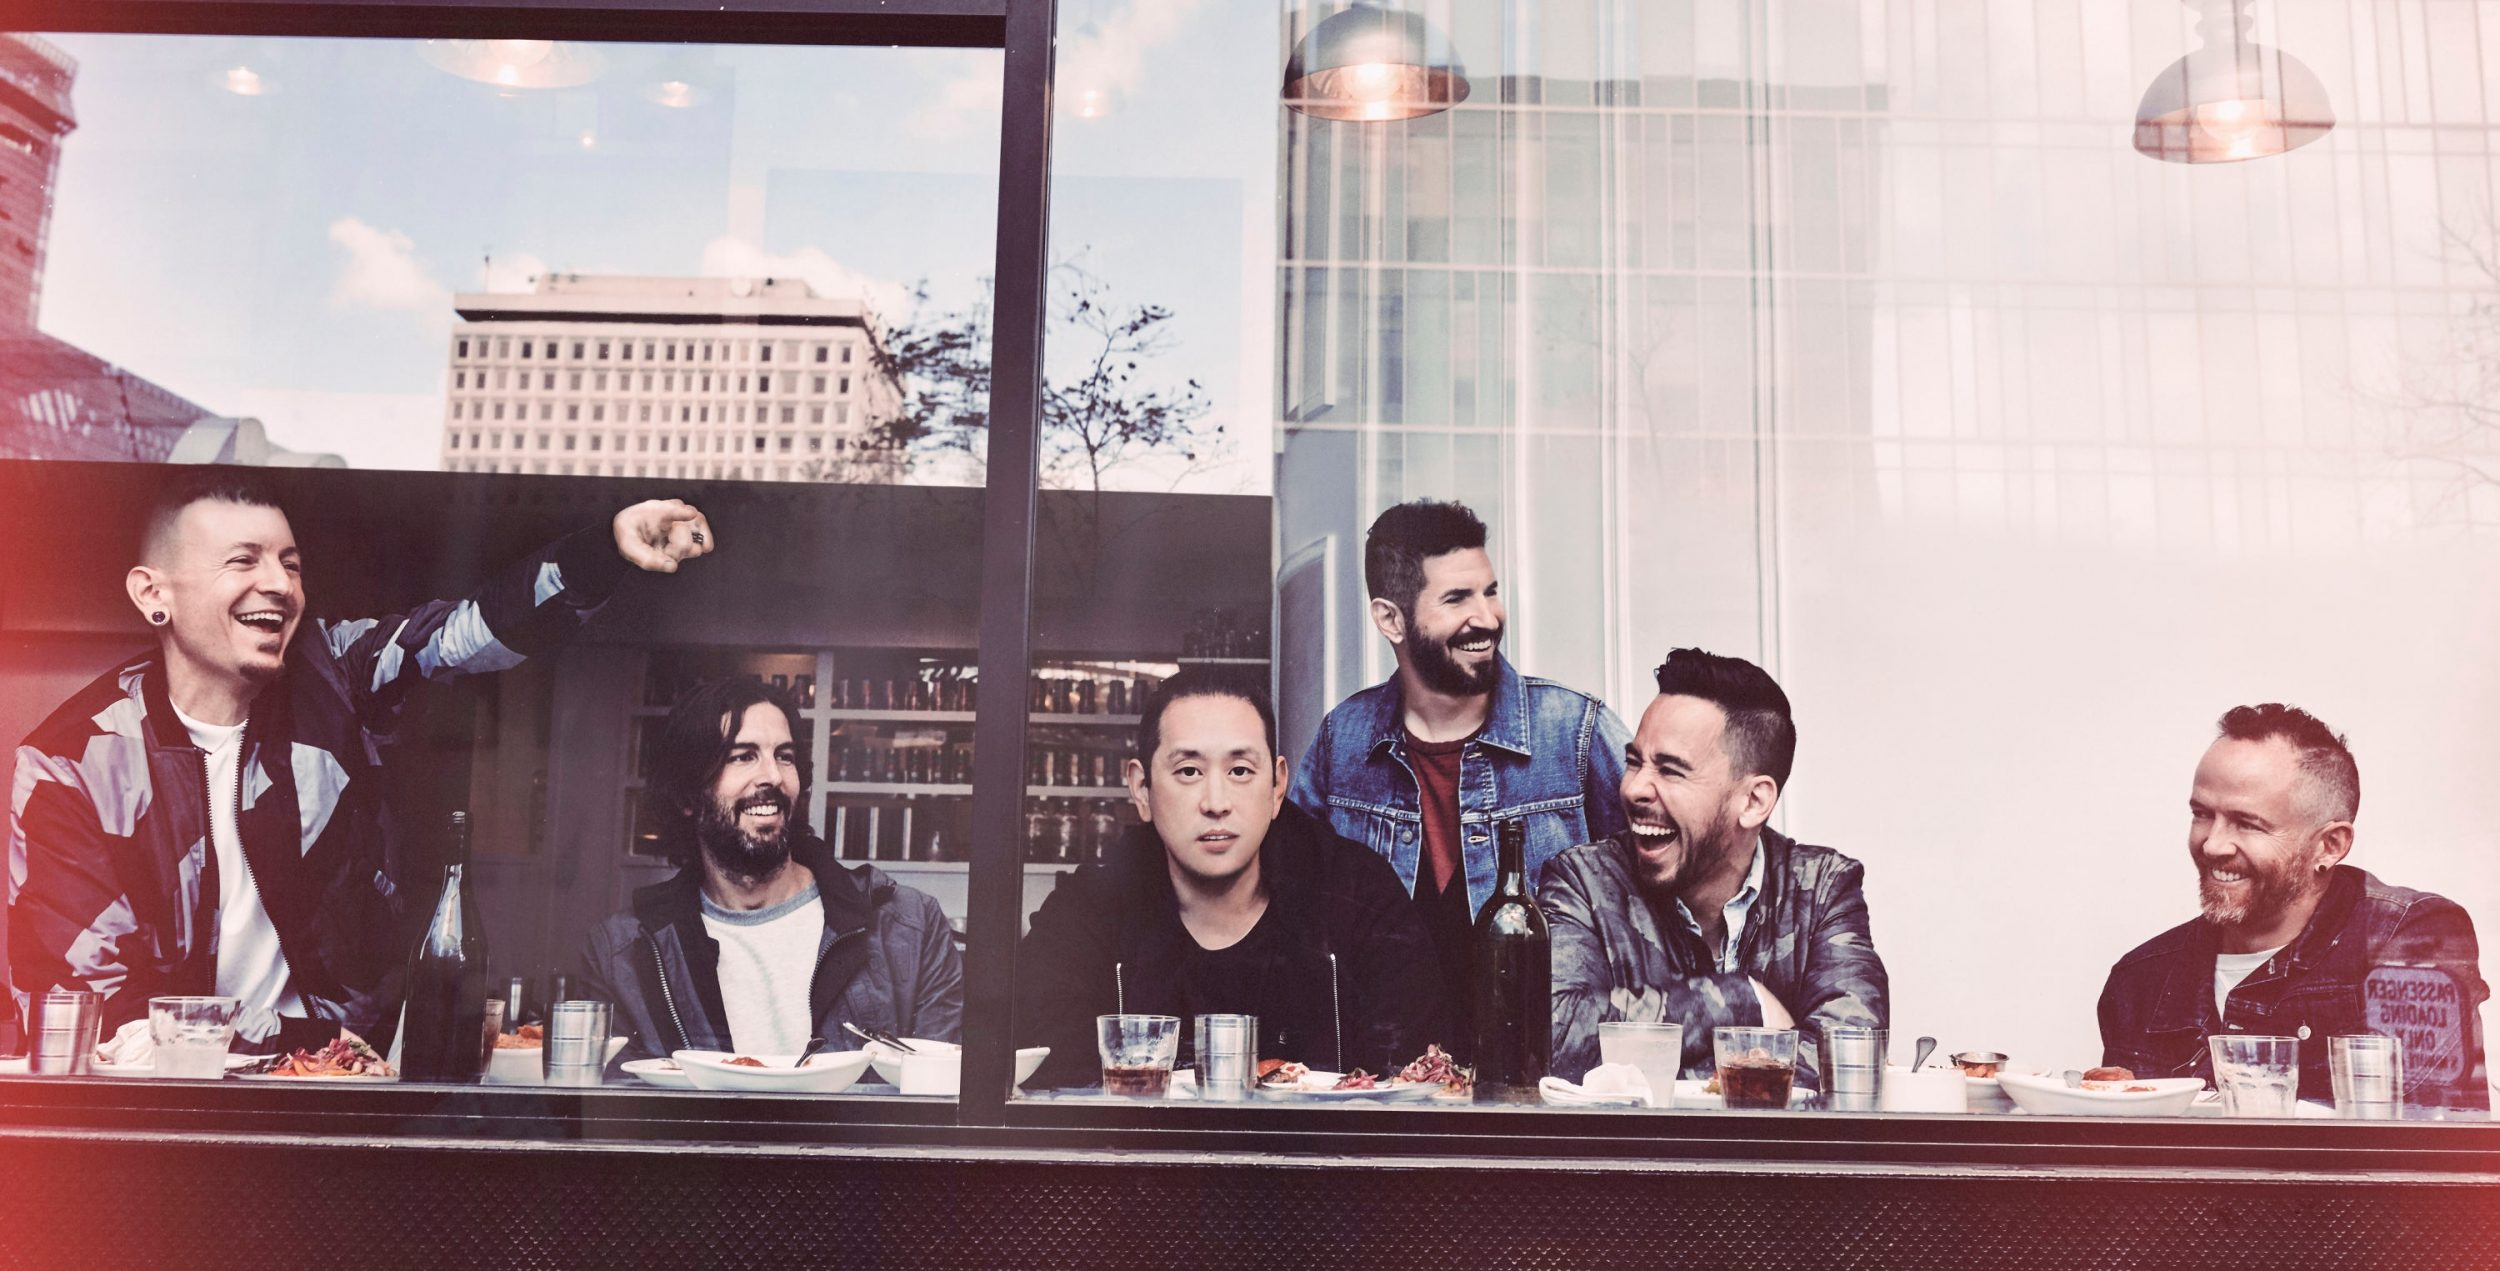 Linkin Park Amp Kiiara Julia Michaels Lorde Enter Top 25